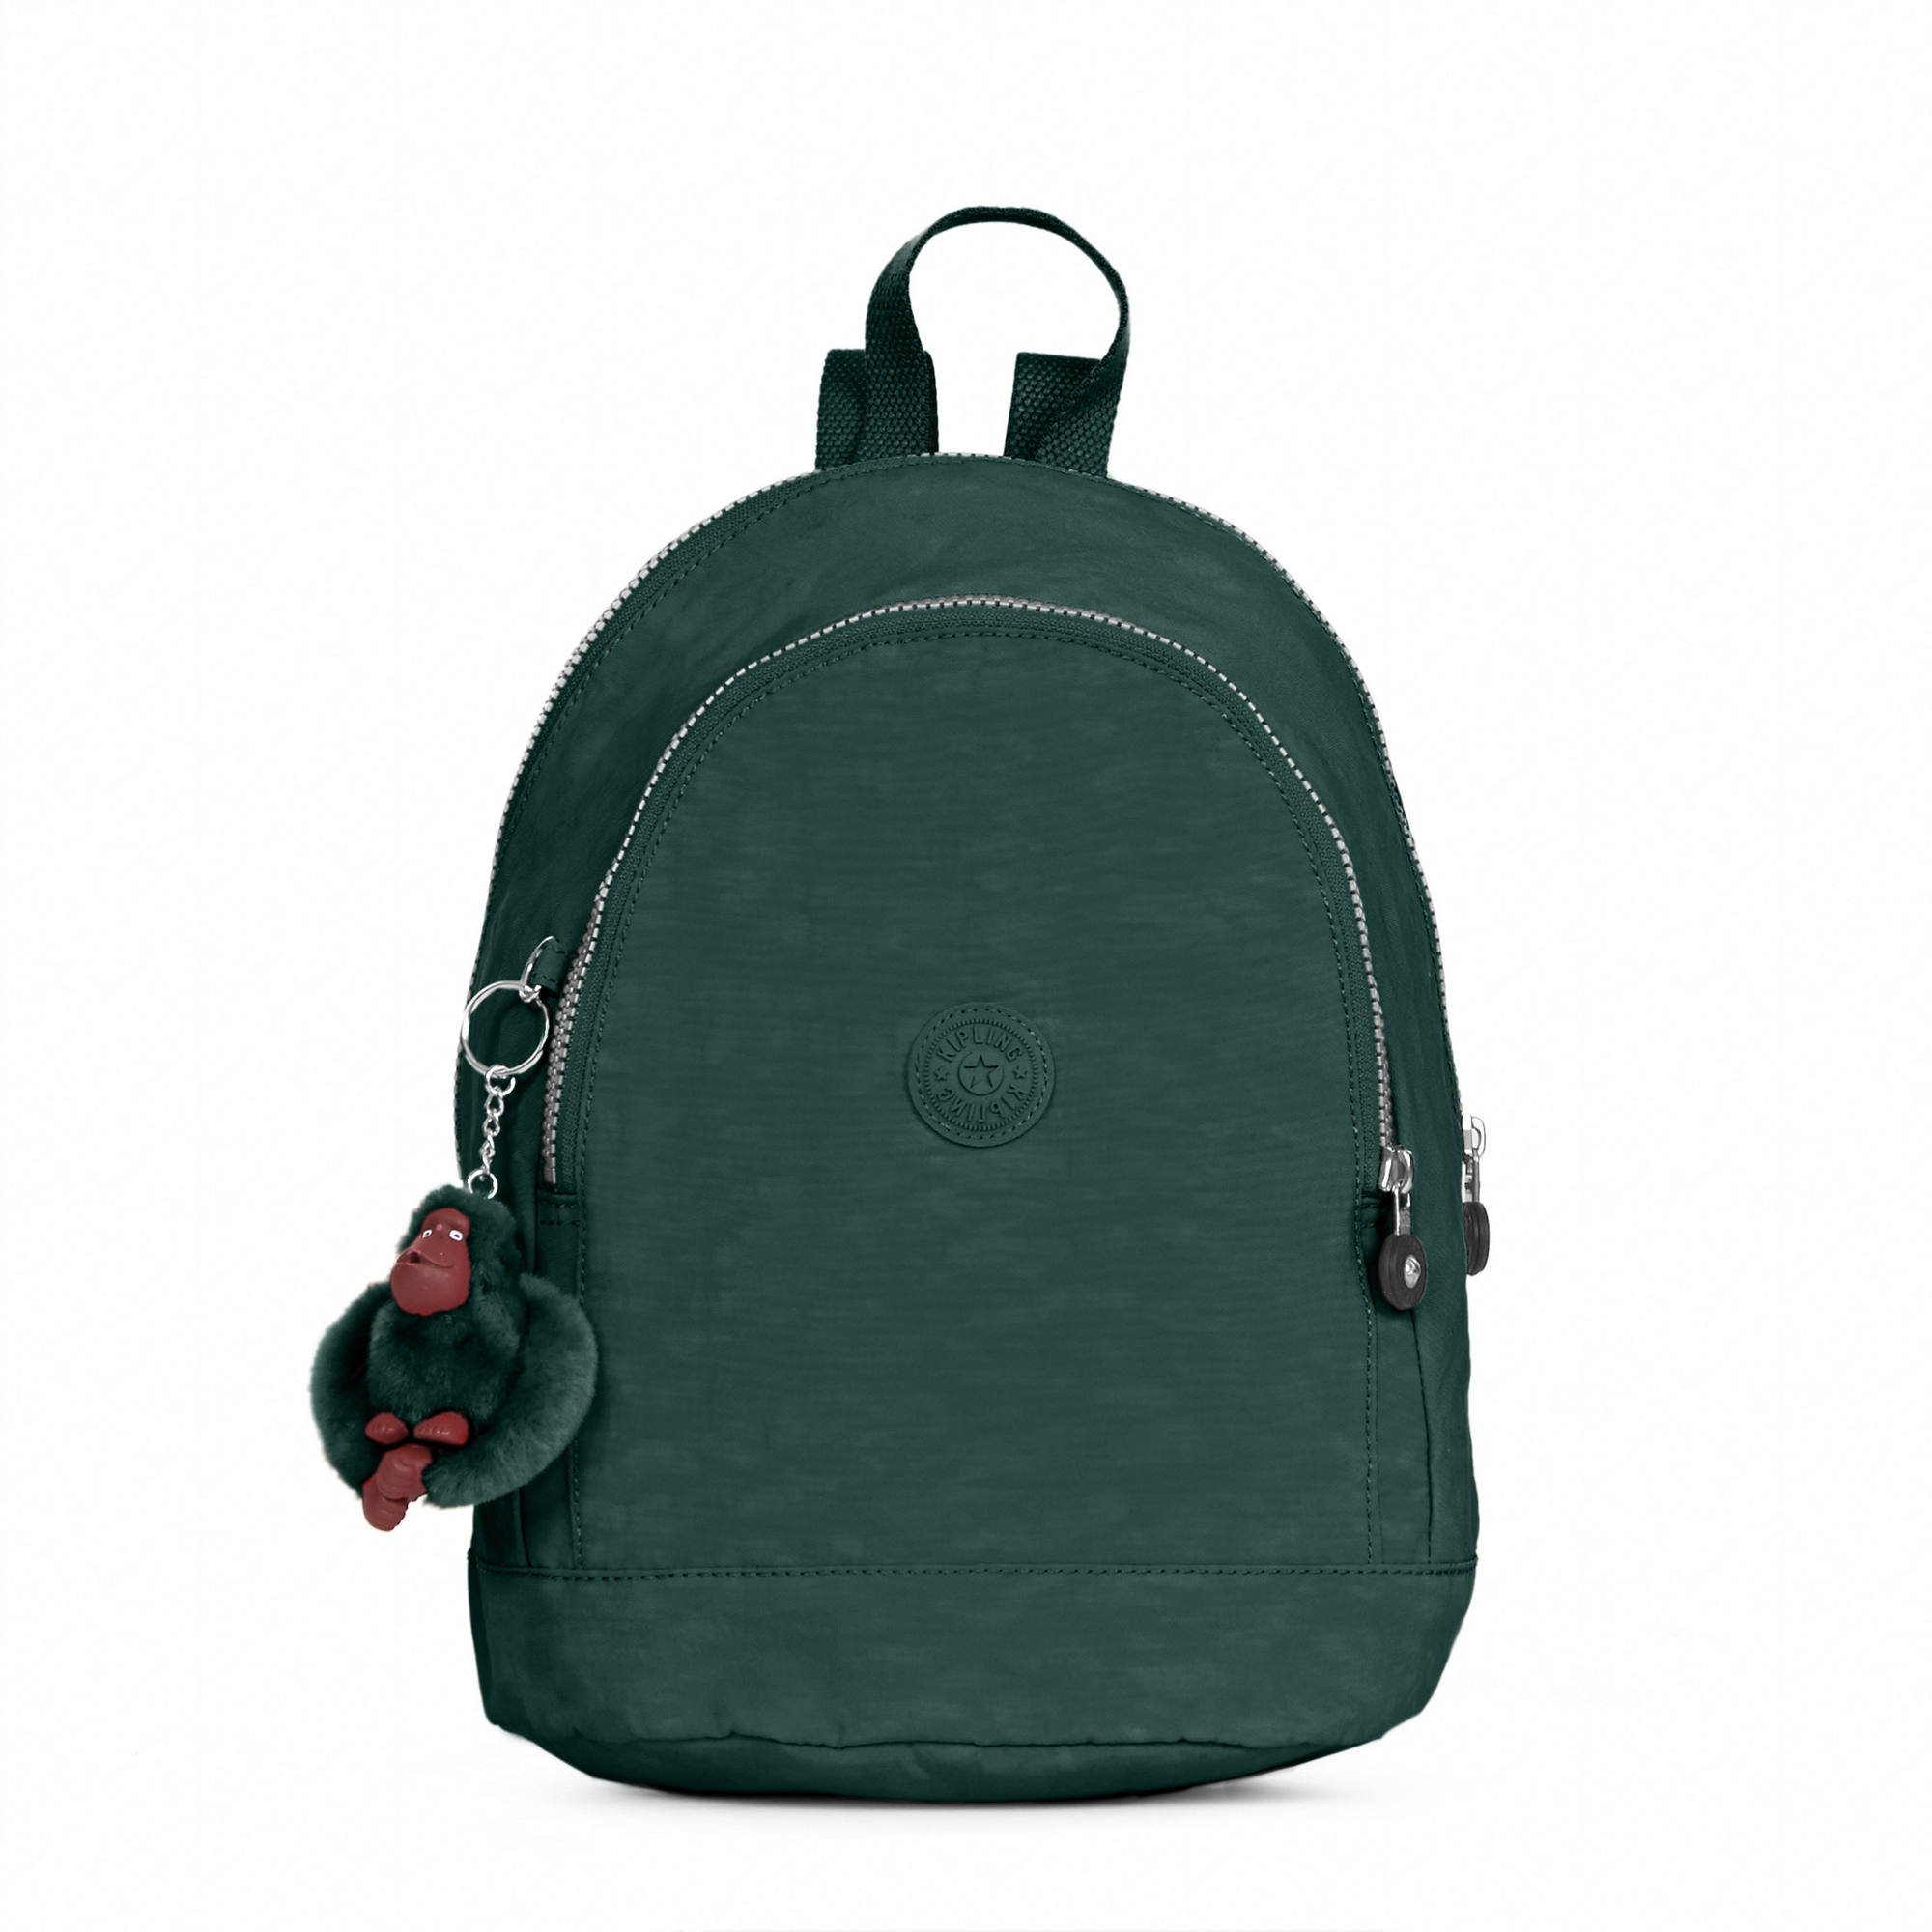 6dfa64a6846 Yaretzi Small Backpack